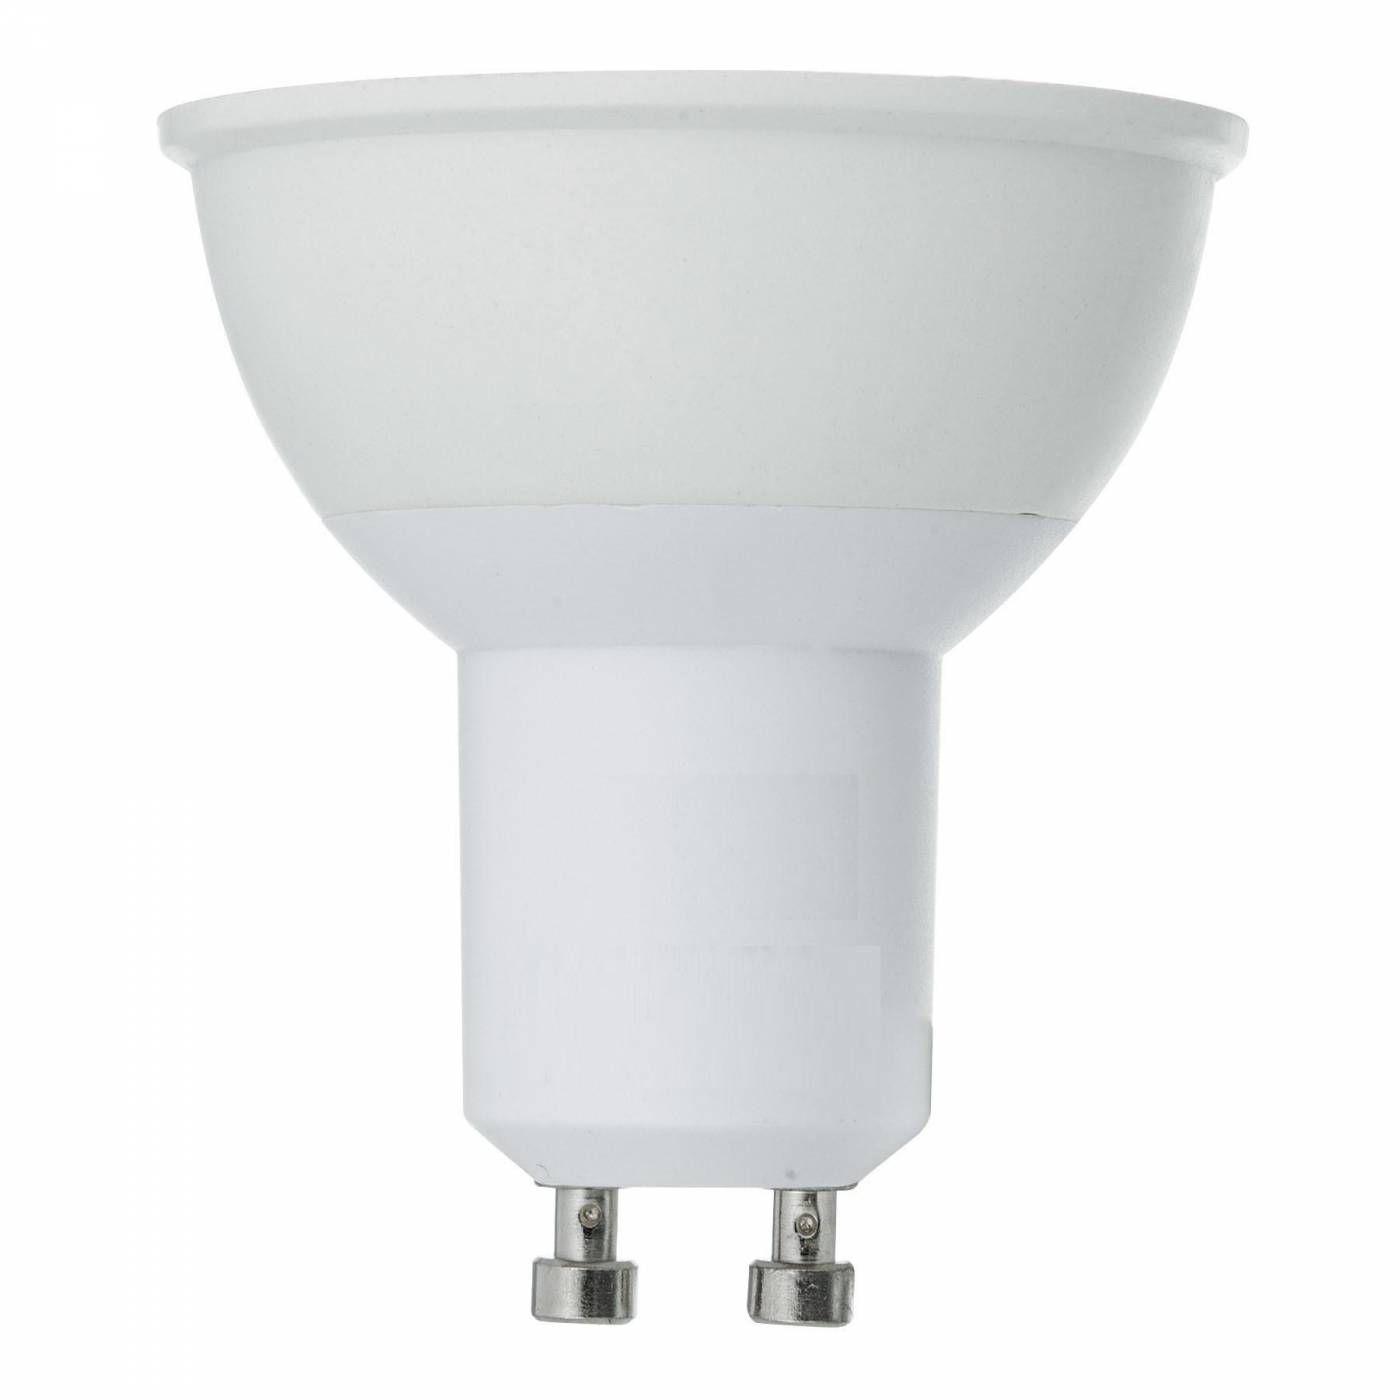 LAMPADA LED DICROICA 6W COB GU10 BIVOLT - BRANCO QUENTE 2700K